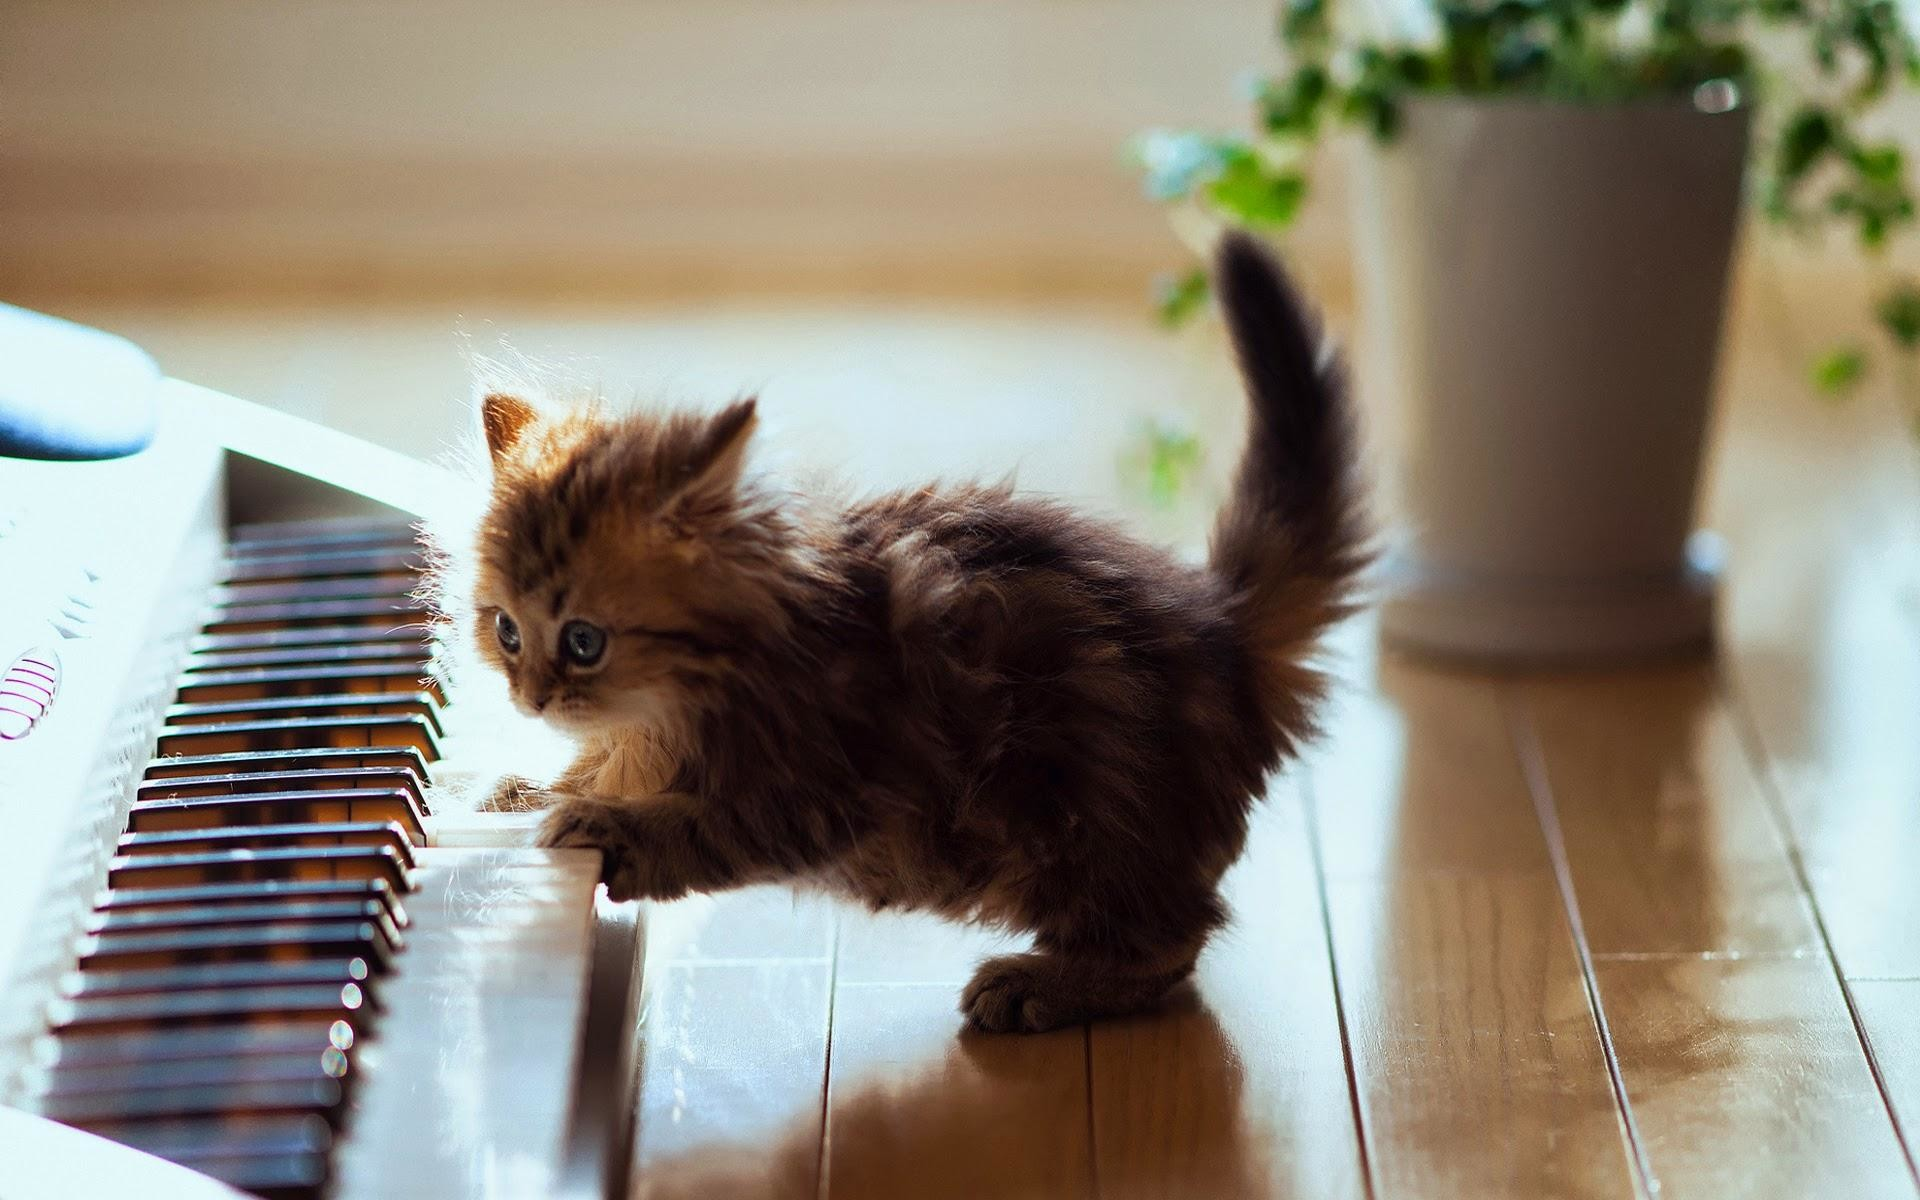 Kitten-playing-the-piano-wallpaper-wp2006707